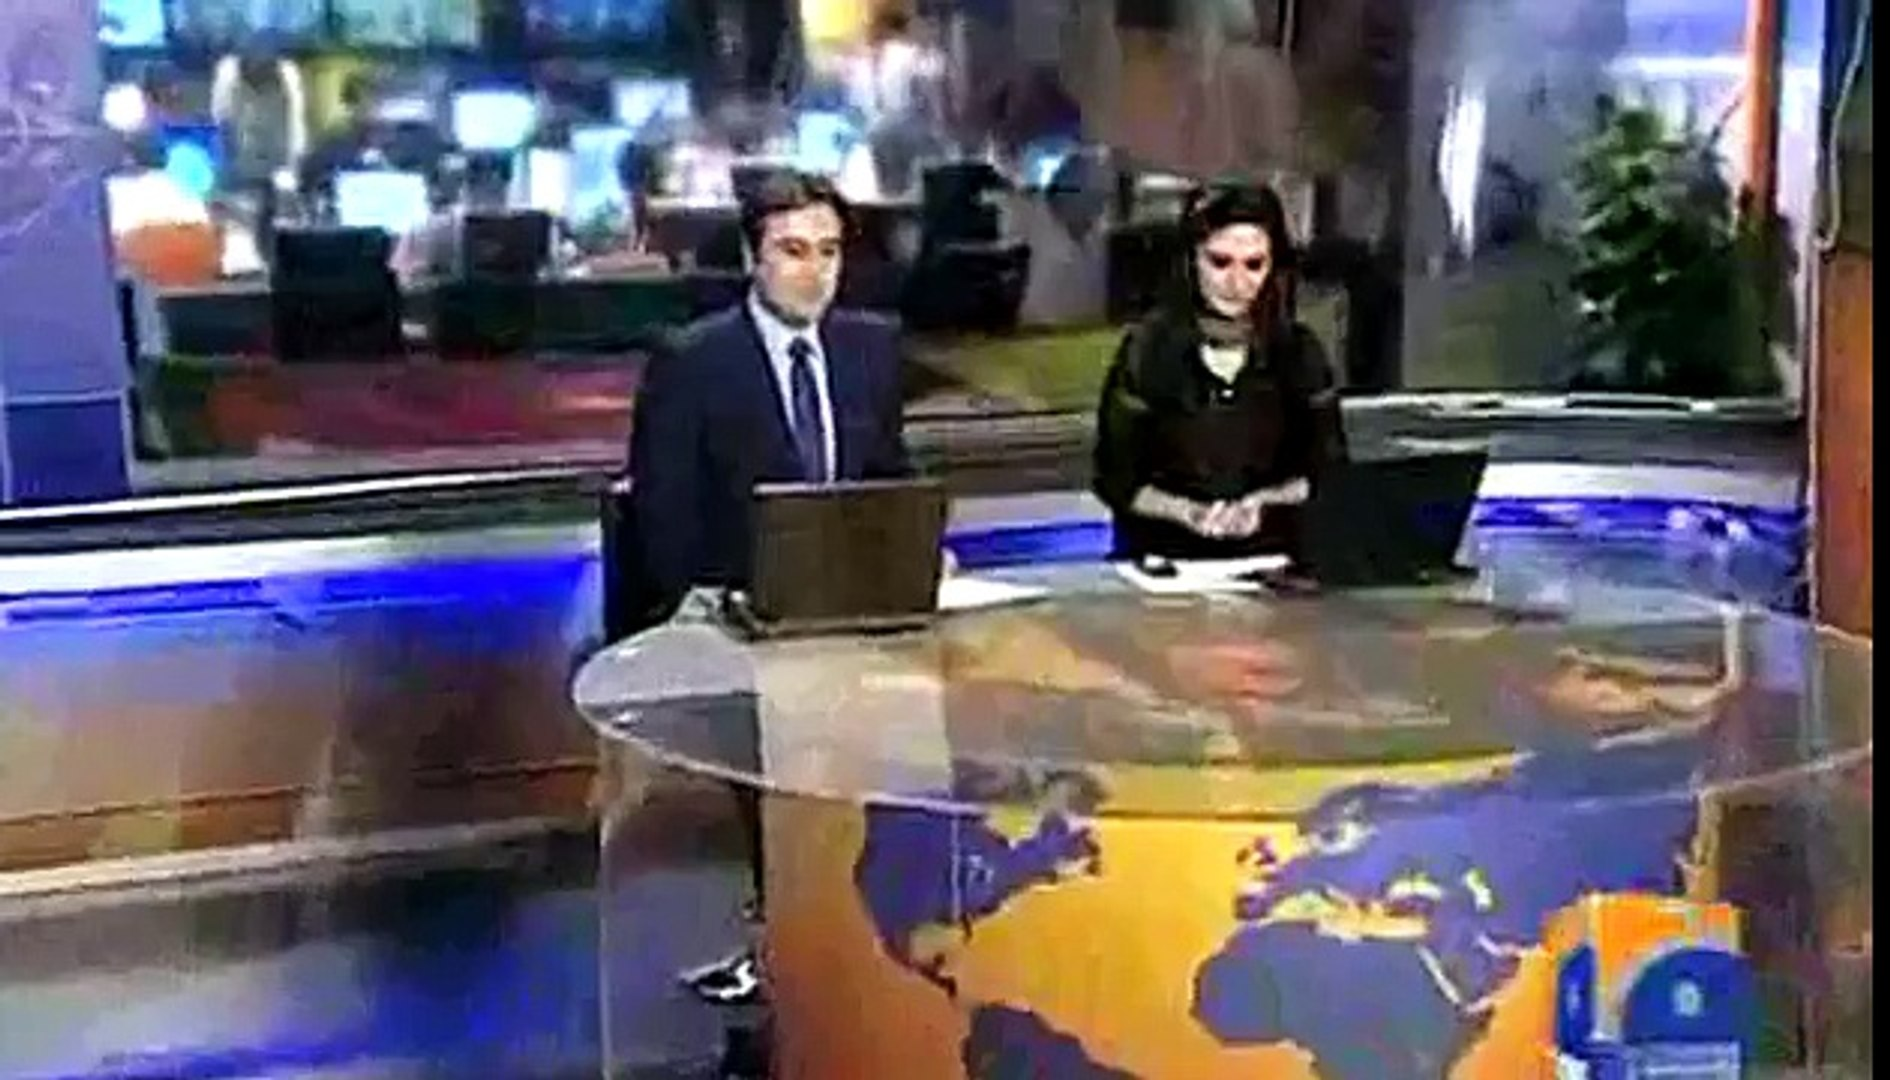 Geo Headlines 18 Sep 2013 Geo News 18 09 2013 BBC News CNN News Today-copypasteads.com